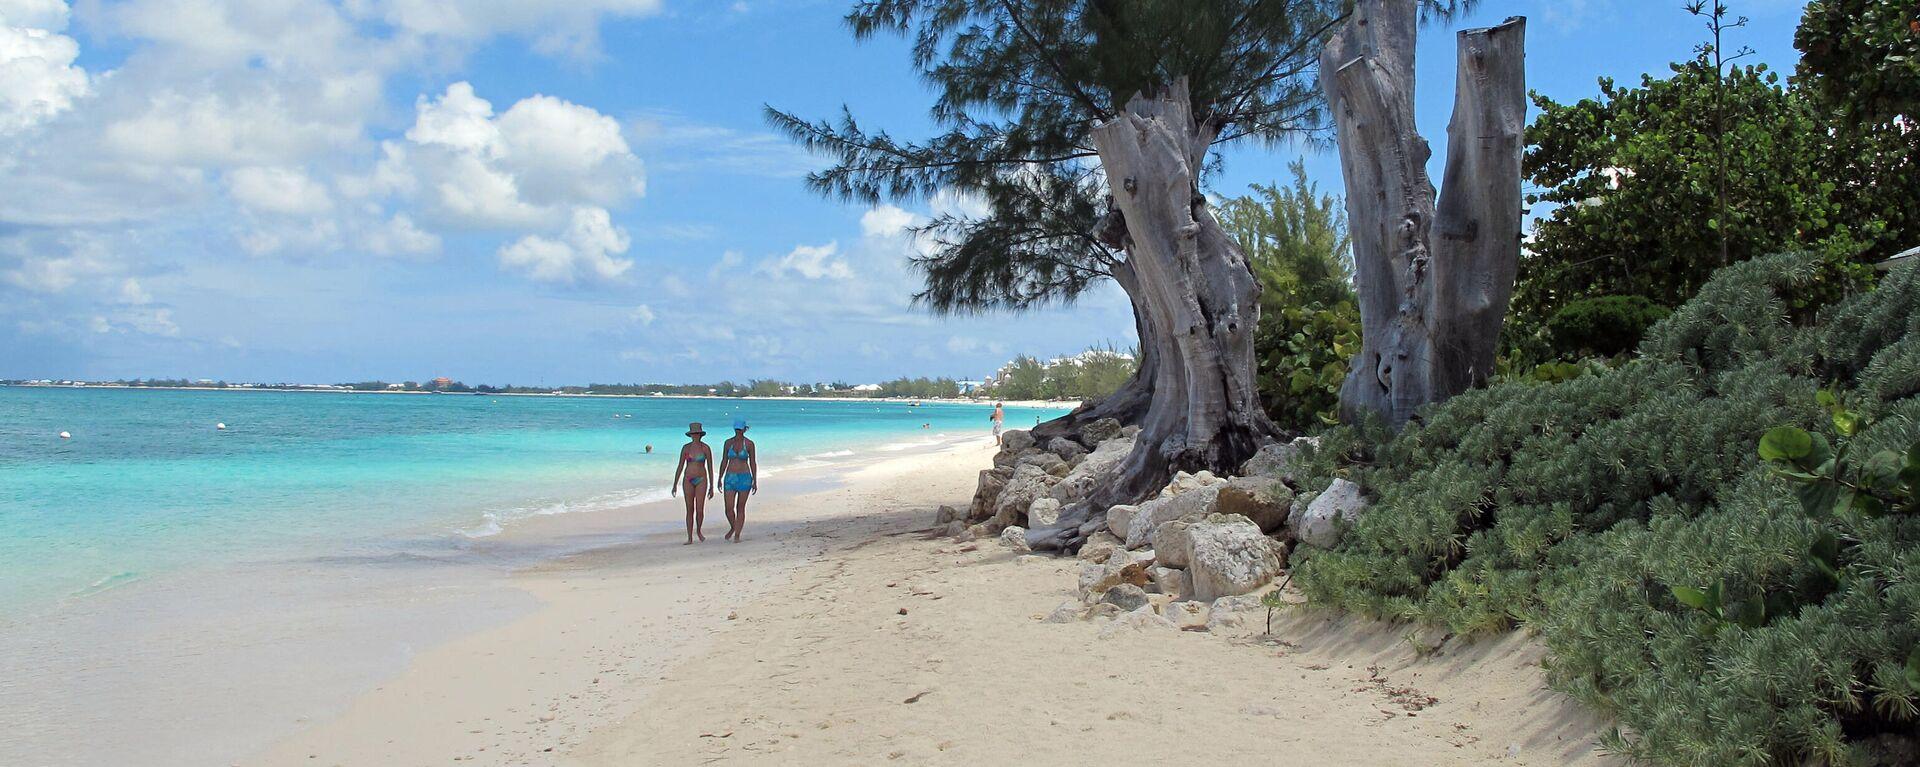 Cayman Islands  - SNA, 1920, 07.09.2021